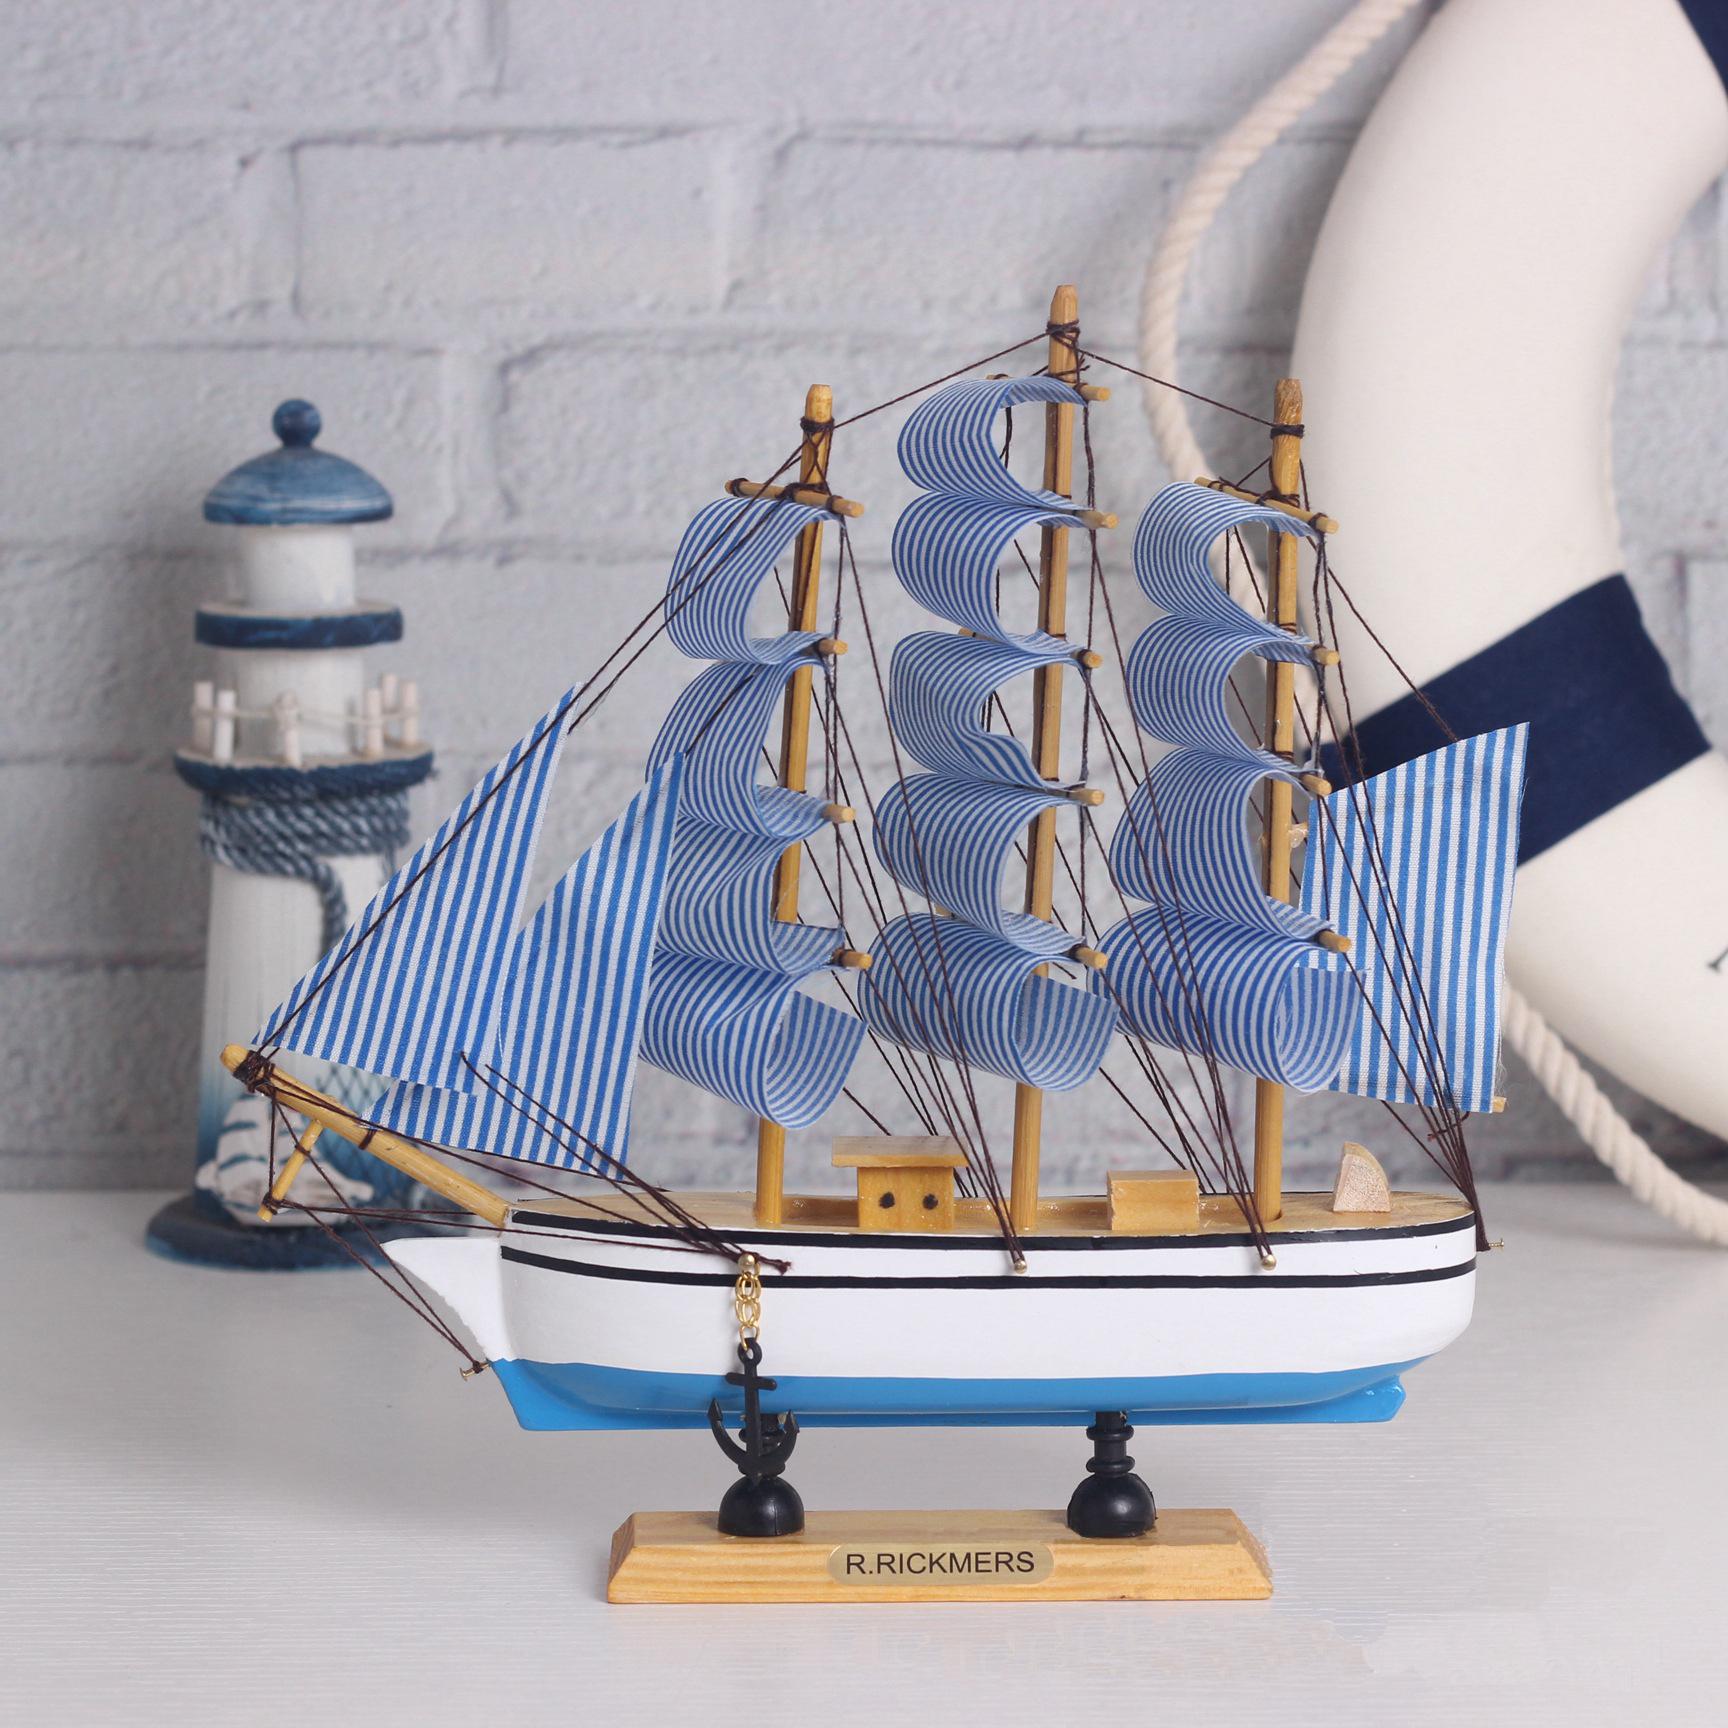 modelo de nave de madera miniatur martima de madera marina nutica barco velero decoracin de escritorio